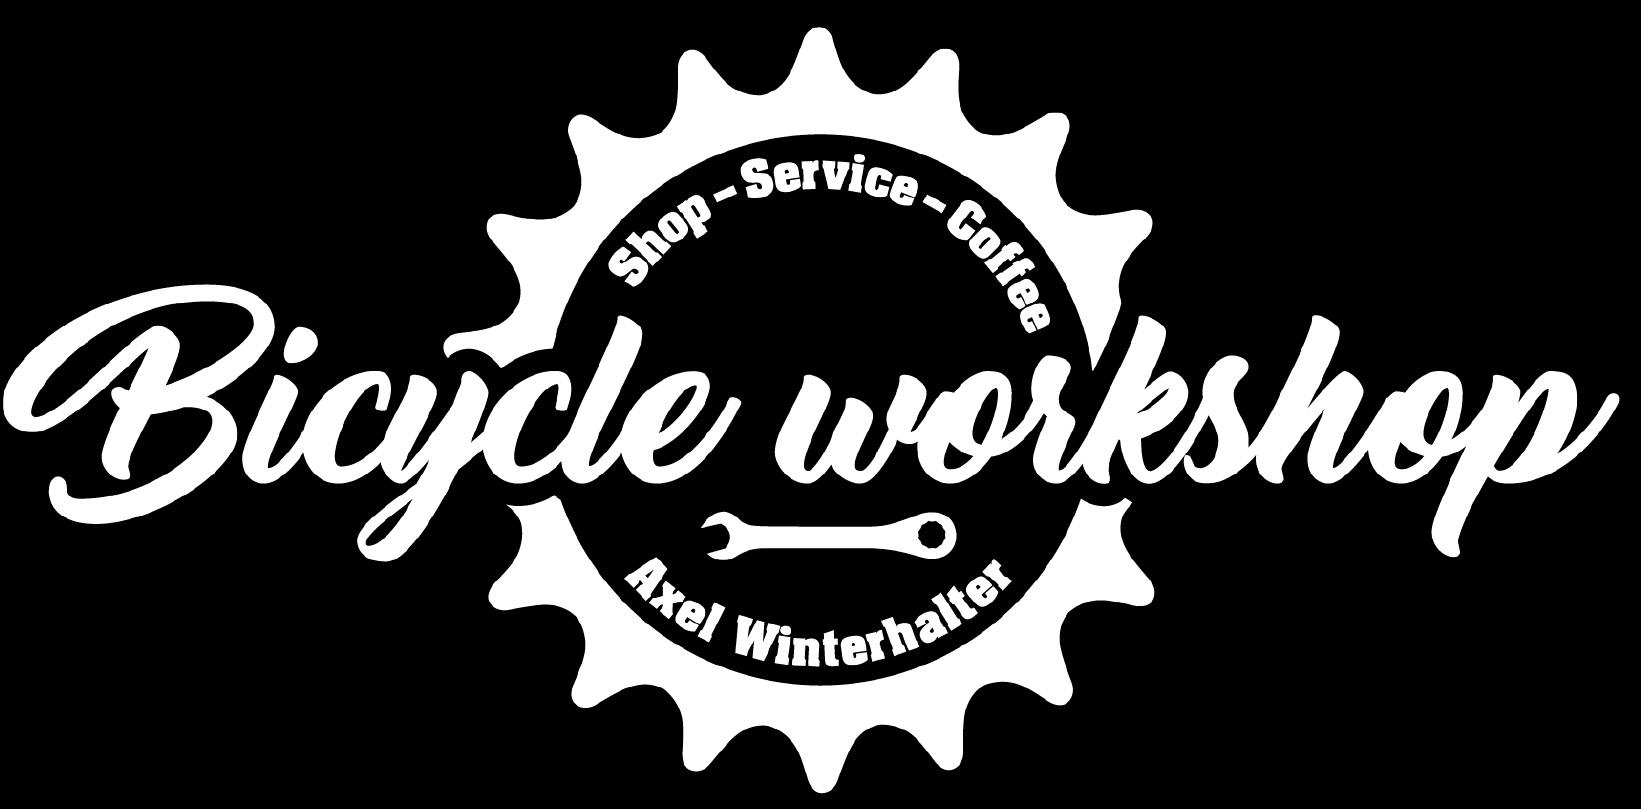 bicycle-workshop-logo_big_negativ